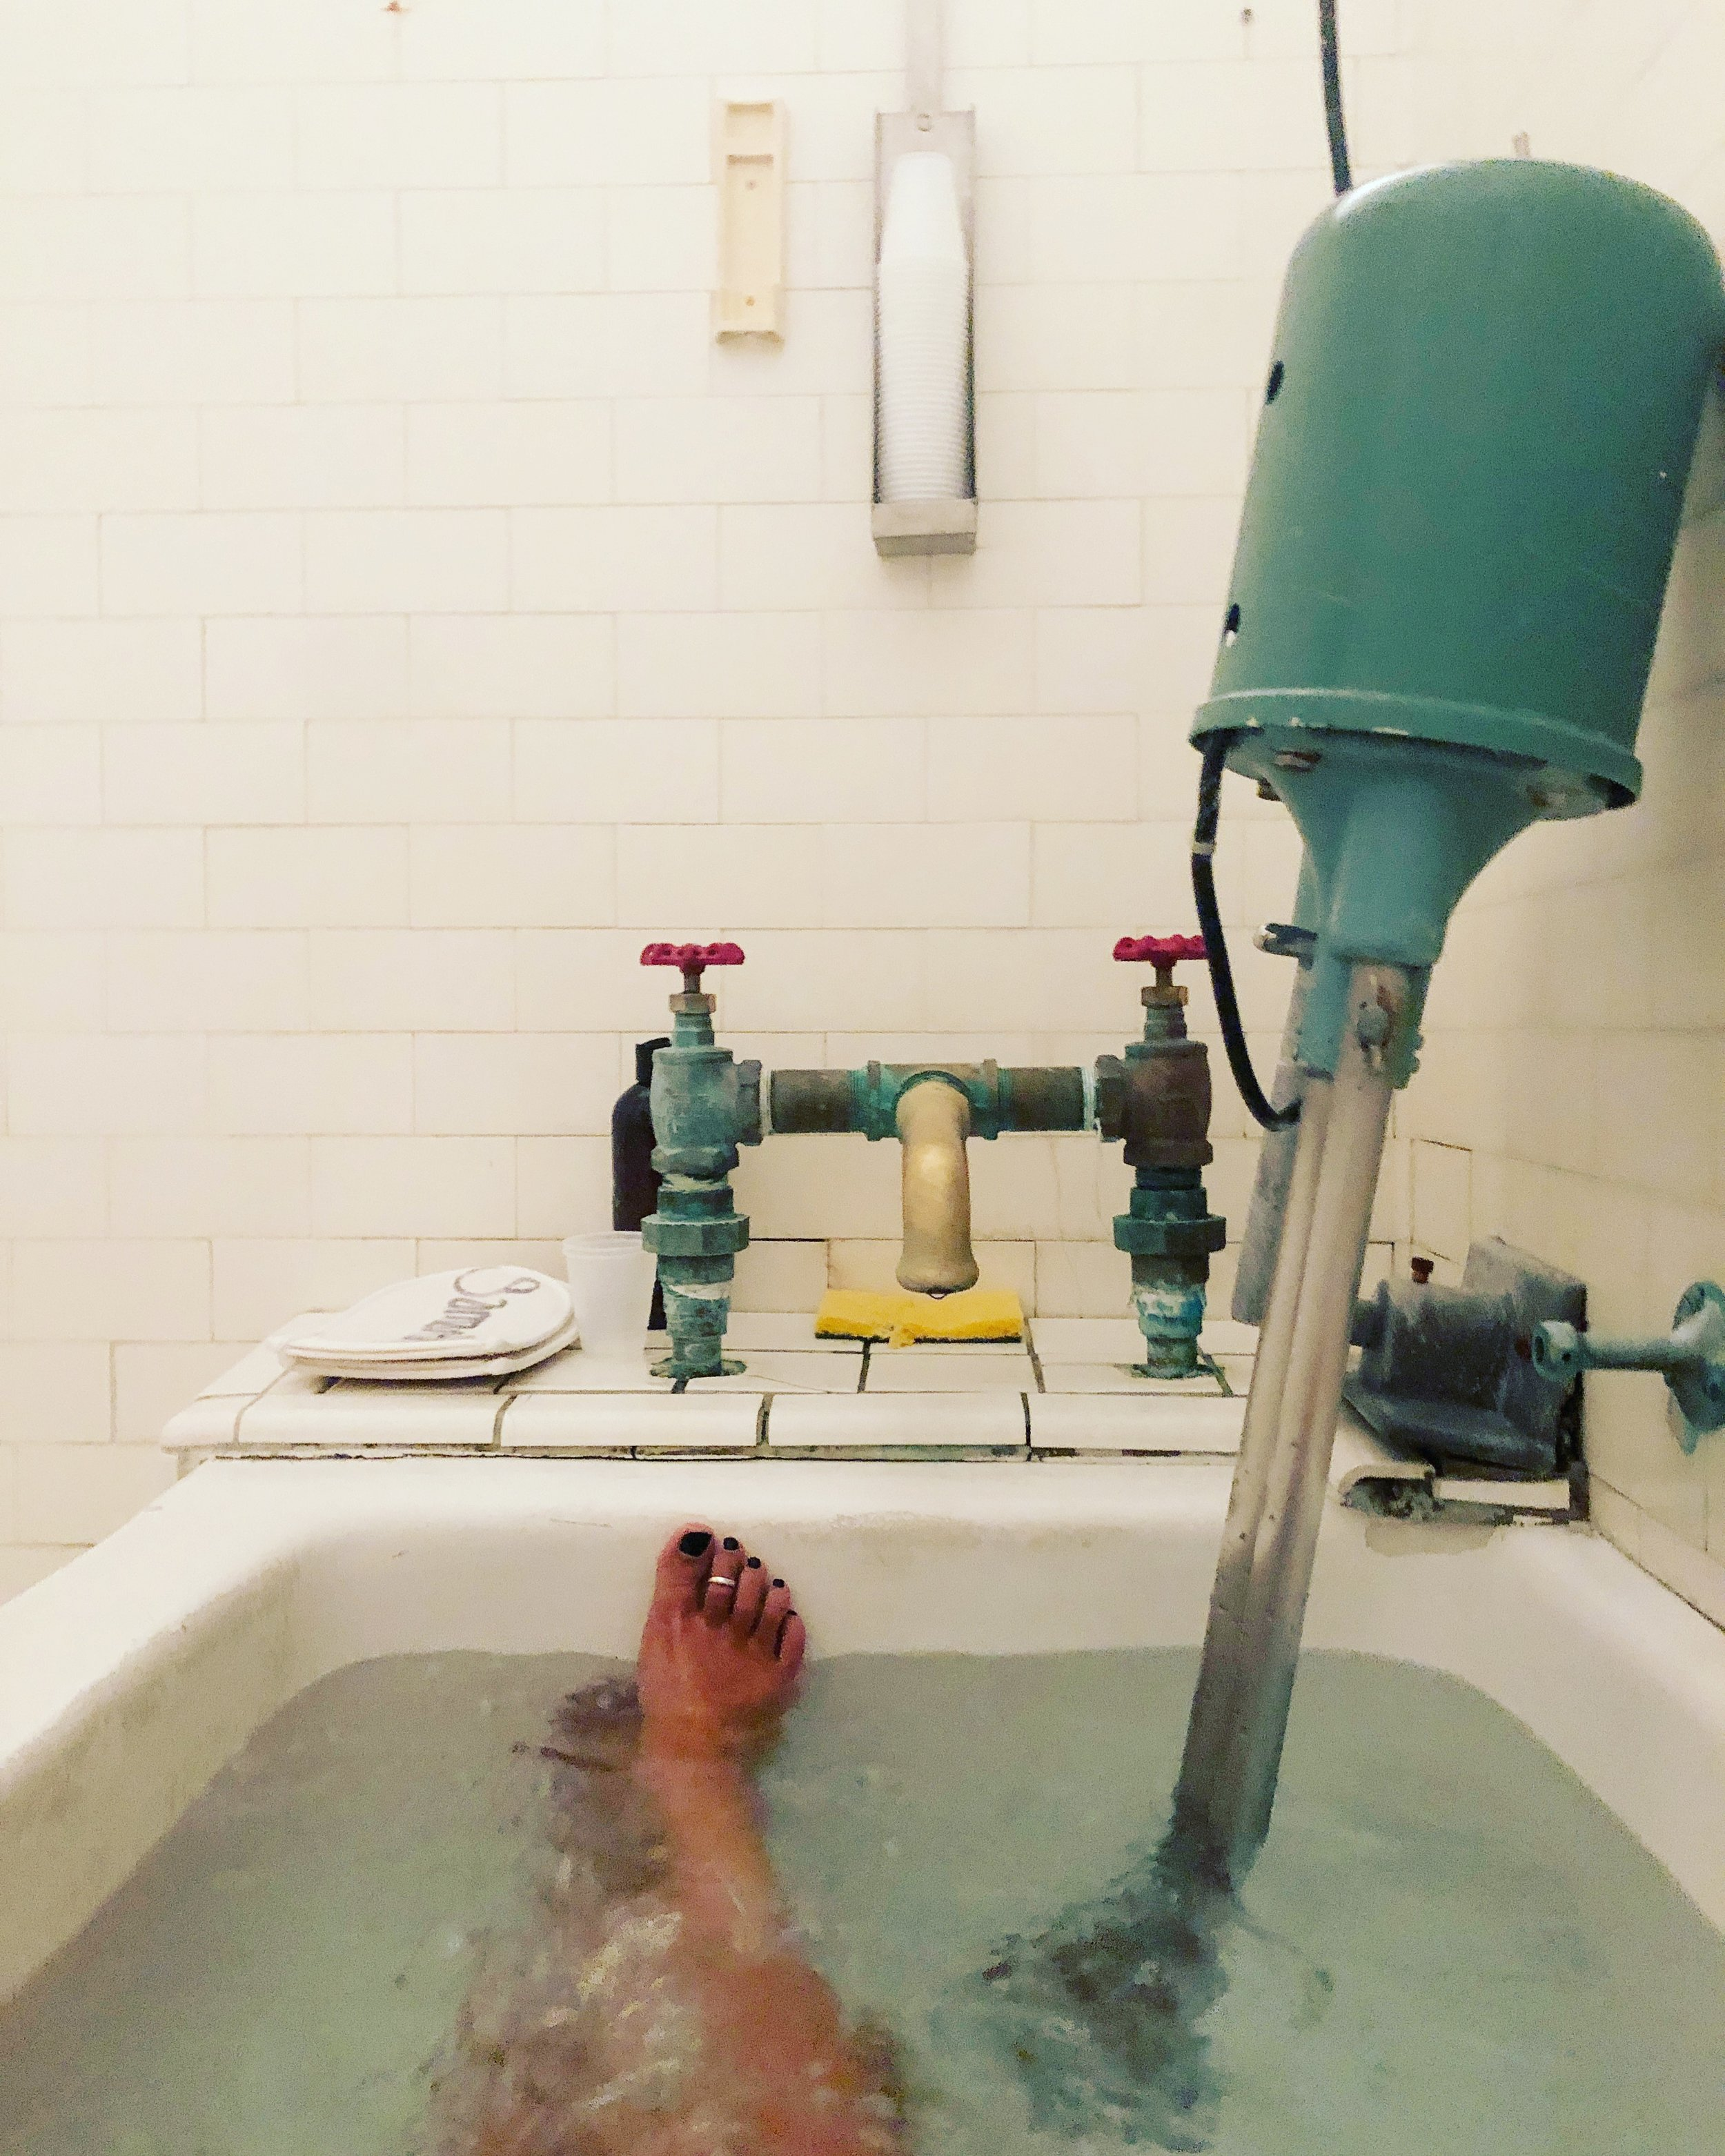 Bathhouse Row, Hot Springs, Arkansas via Weekend Trips From Nashville